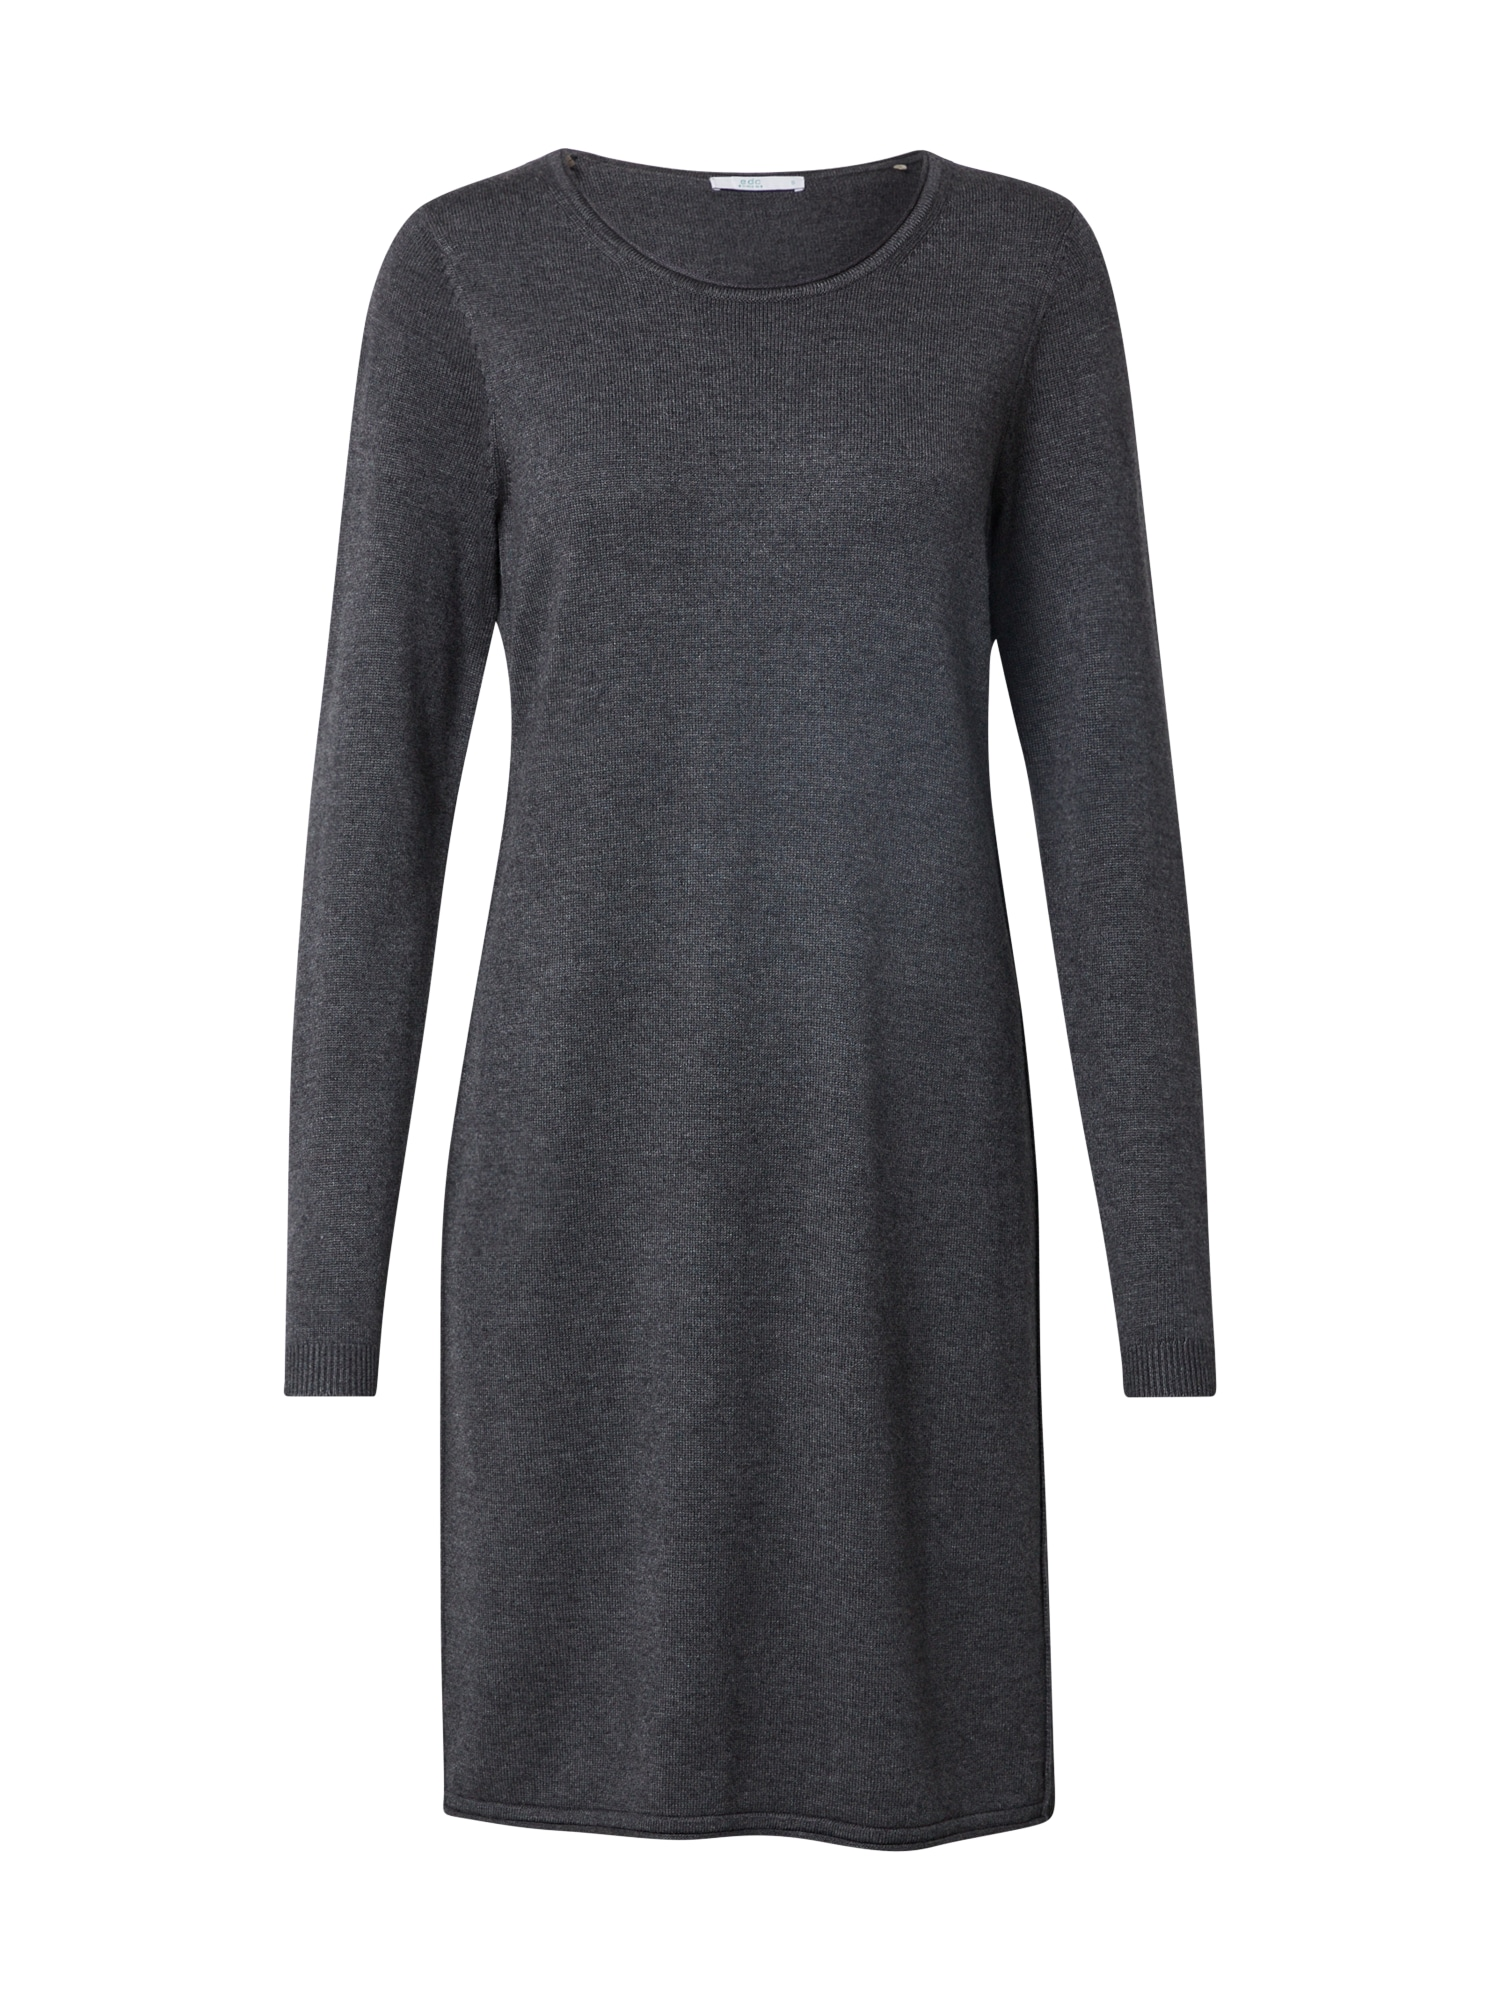 EDC BY ESPRIT Megzta suknelė tamsiai pilka